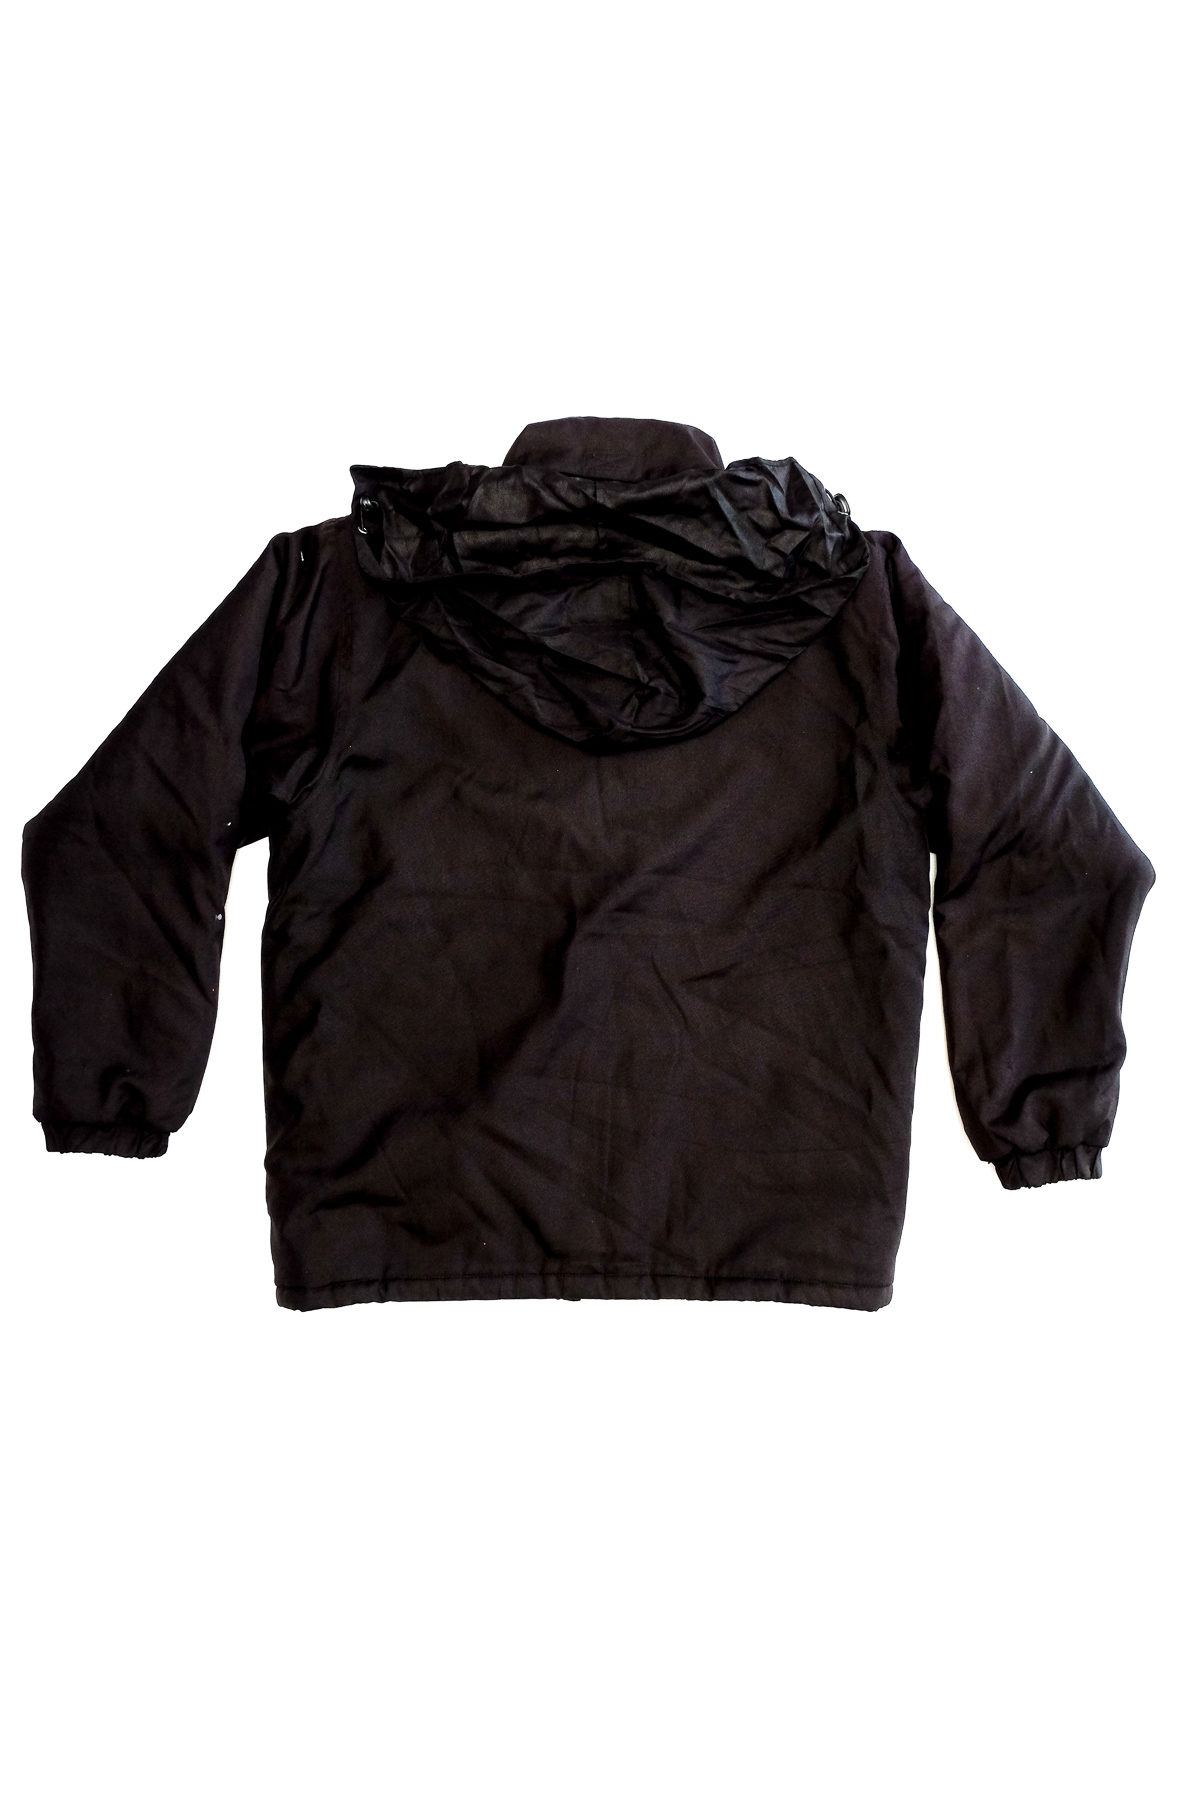 Robe Di Kappa GIUBBINO VINTAGE Black